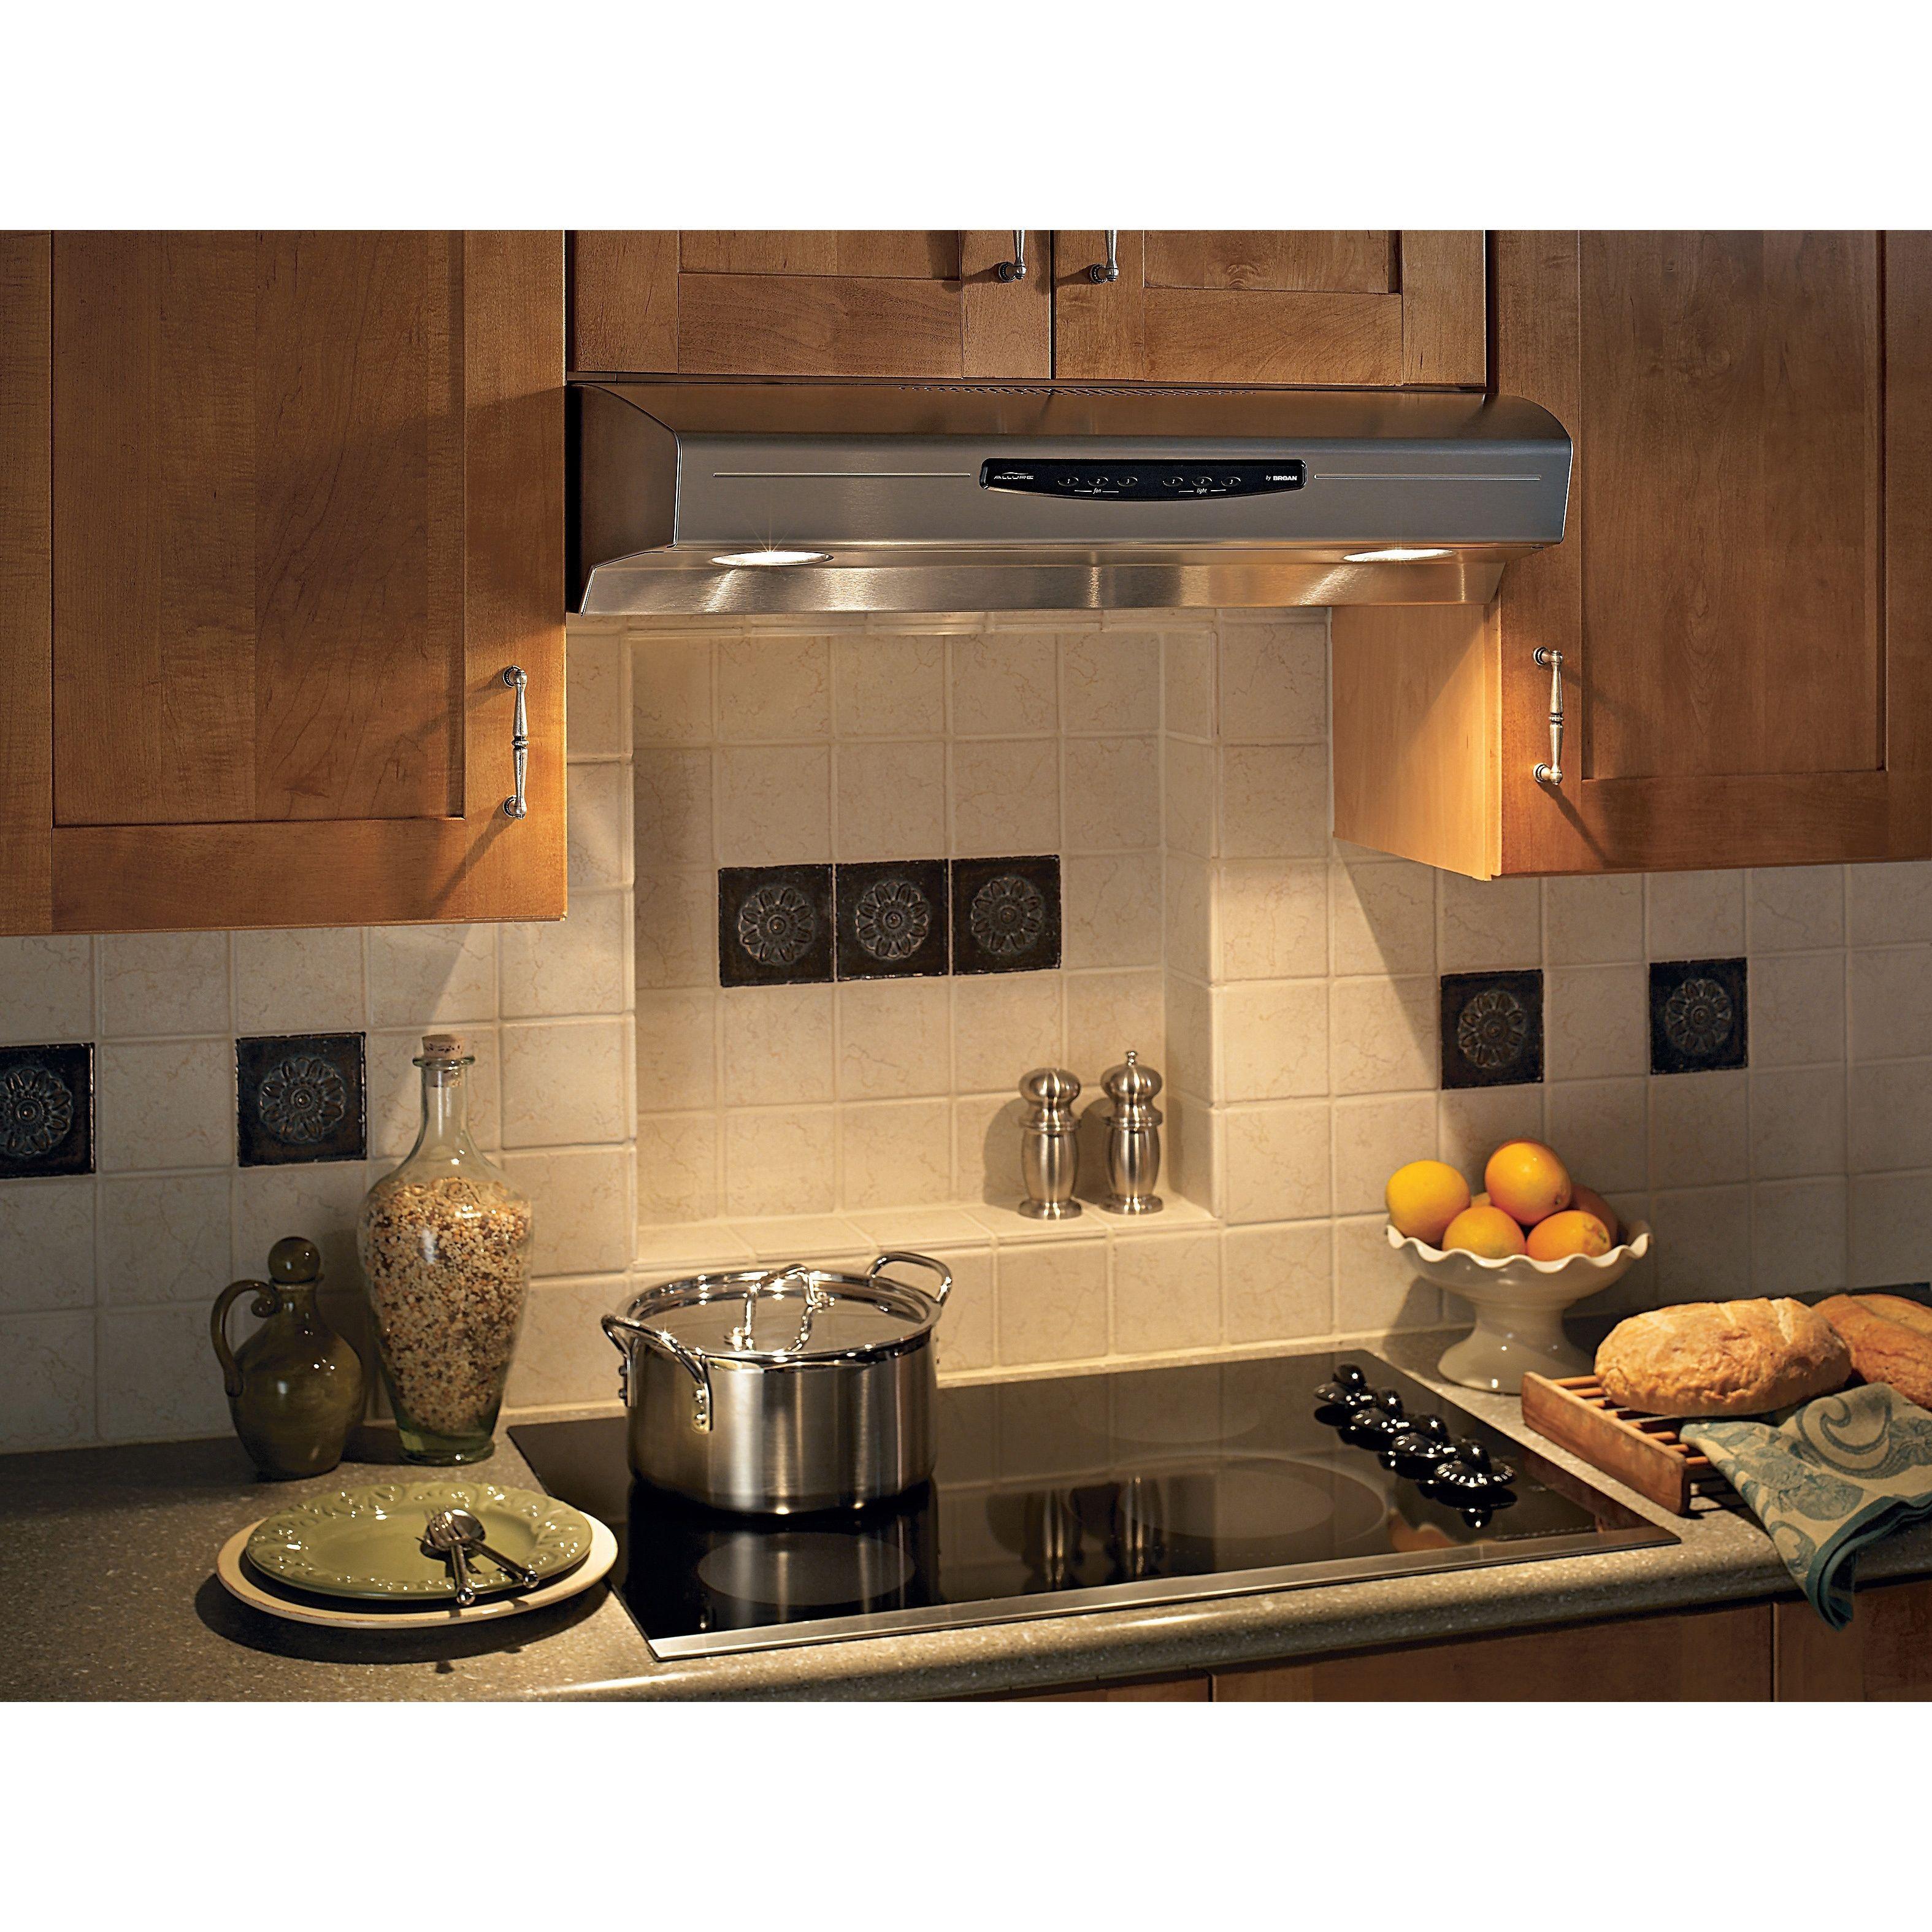 Broan QS230 Allure Series 30 Inch Stainless Steel (Silver) Under Cabinet  300 CFM